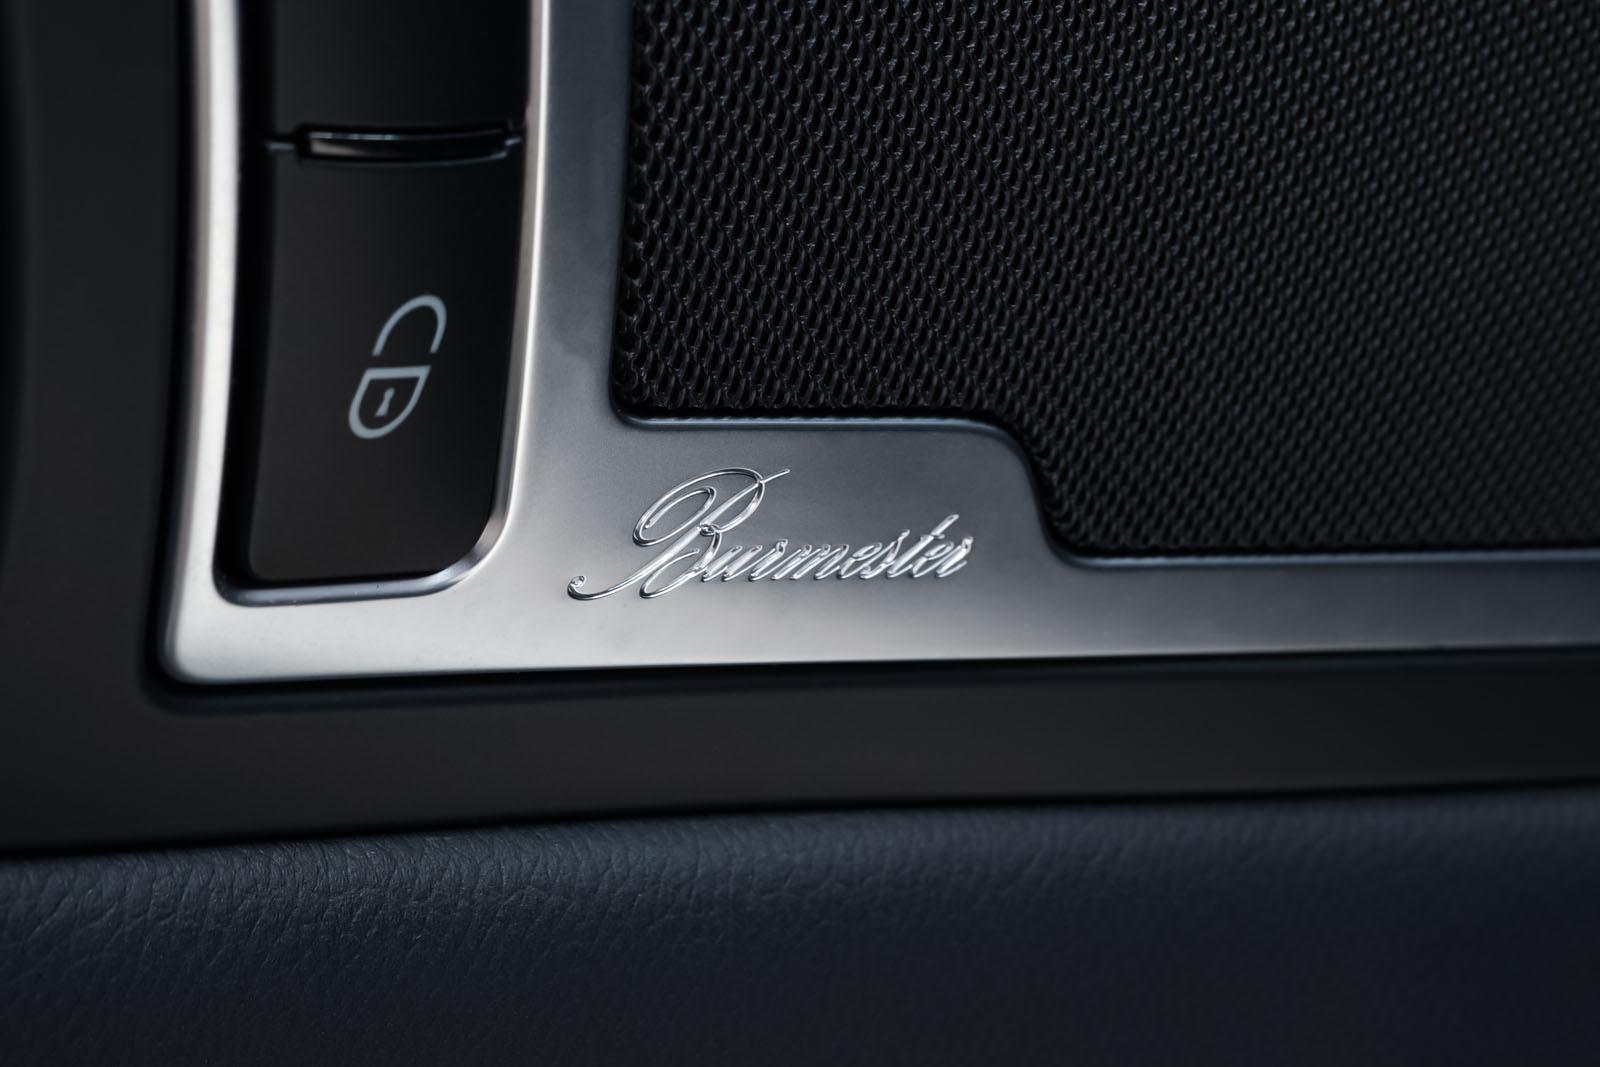 11Mercedes_Benz_AMG_GT_Roadster_Weiss_Schwarz_MB-9710_10_w